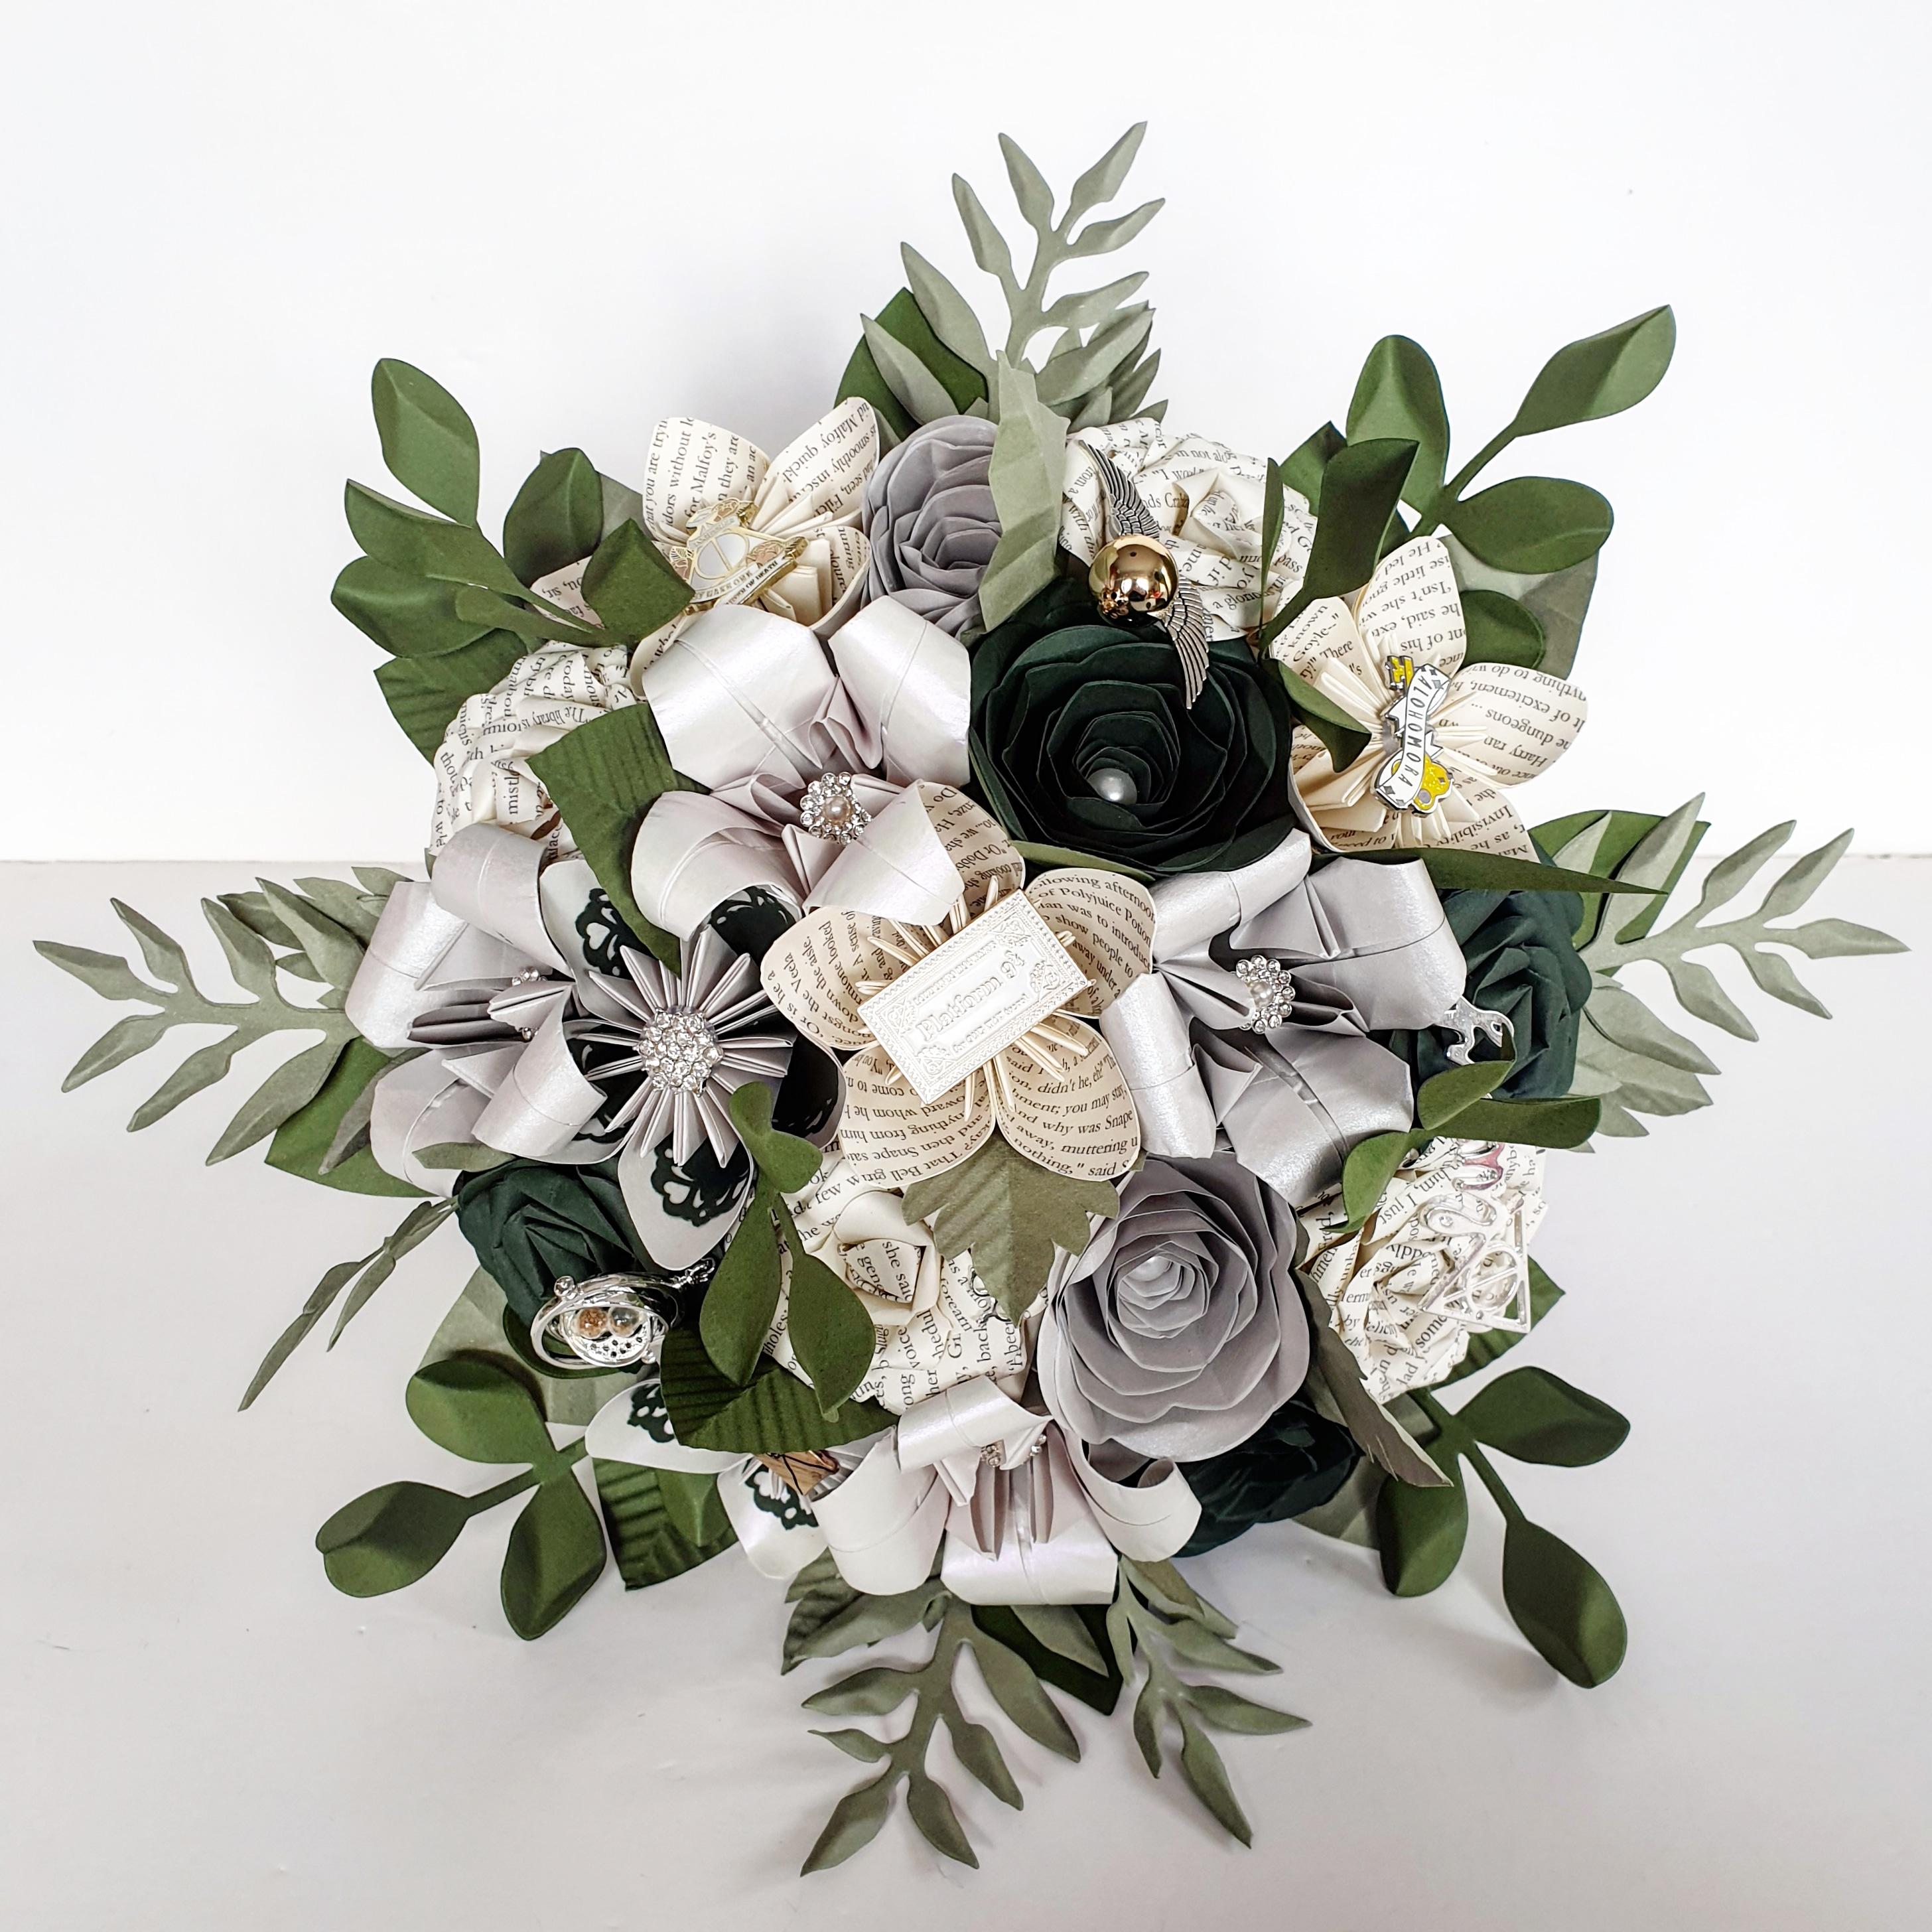 Harry Potter slytherine wedding theme bridal flowers bouquet ideas